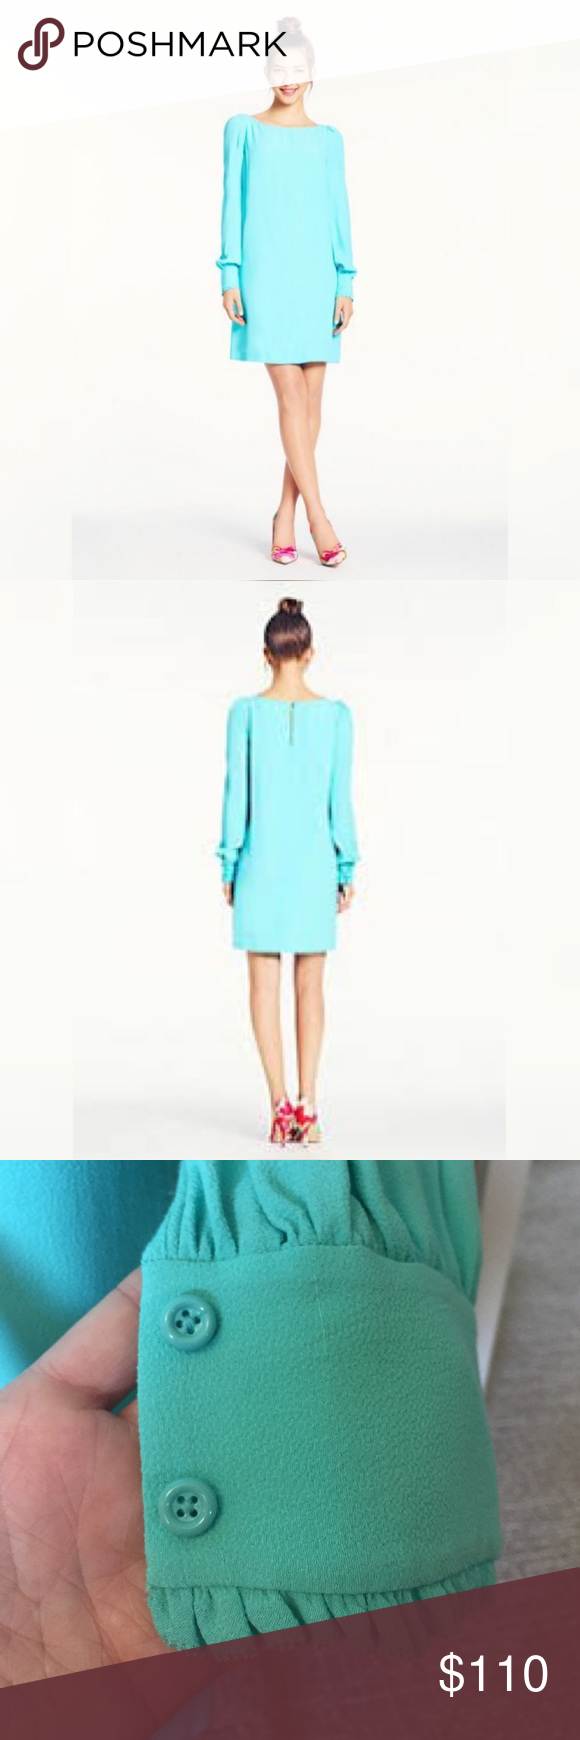 ♠️NWT Kate Spade Cordette Dress 👗 Sz 6 NWT light blue Cordette dress by Kate Spade. Size 6 kate spade Dresses Long Sleeve